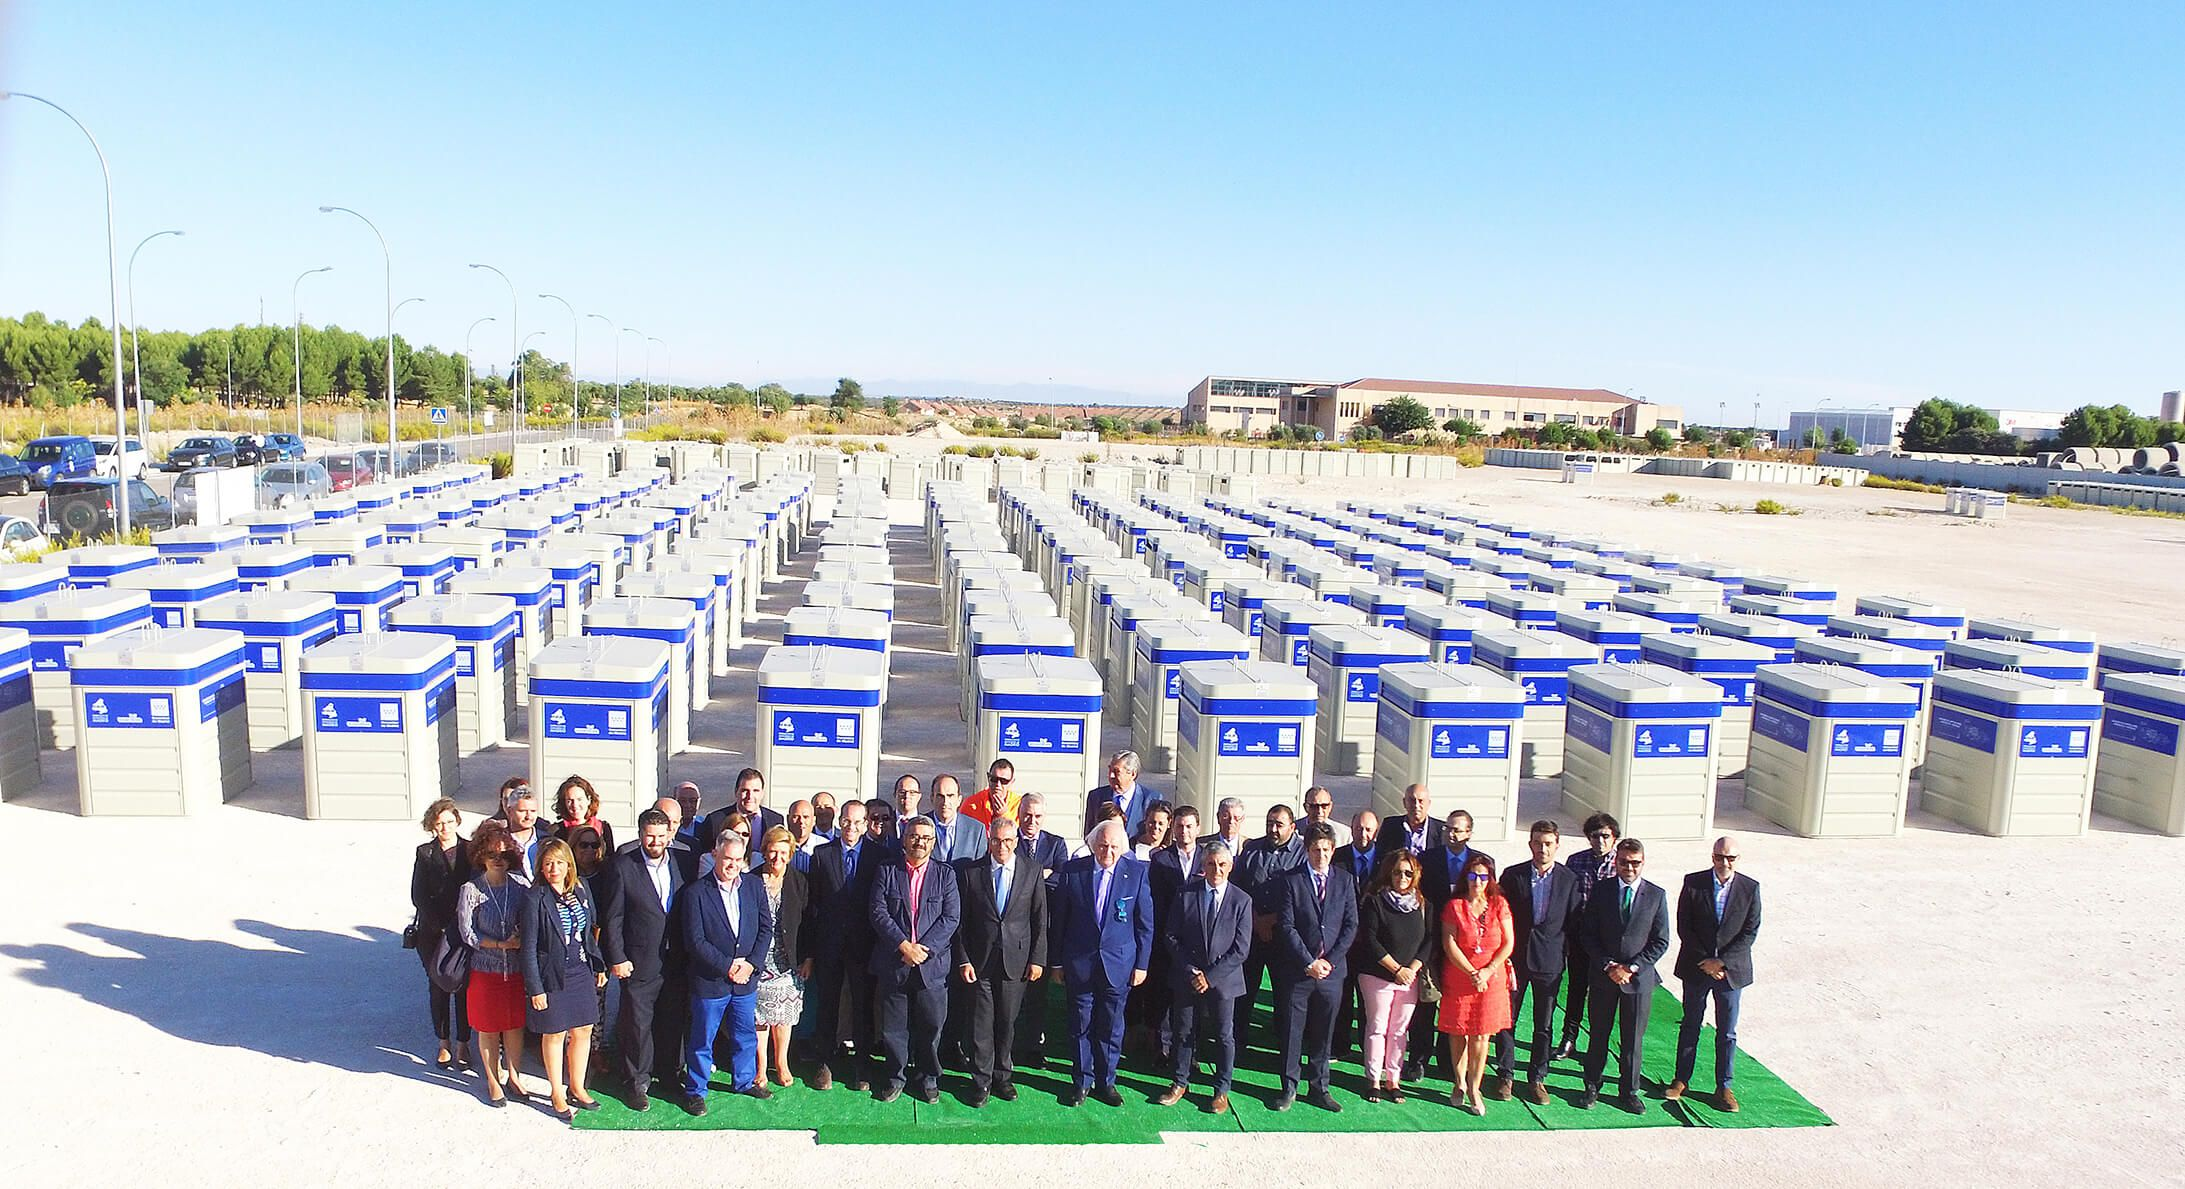 Sanimobel instala 400 contenedores antihurto en 71 municipios de Madrid